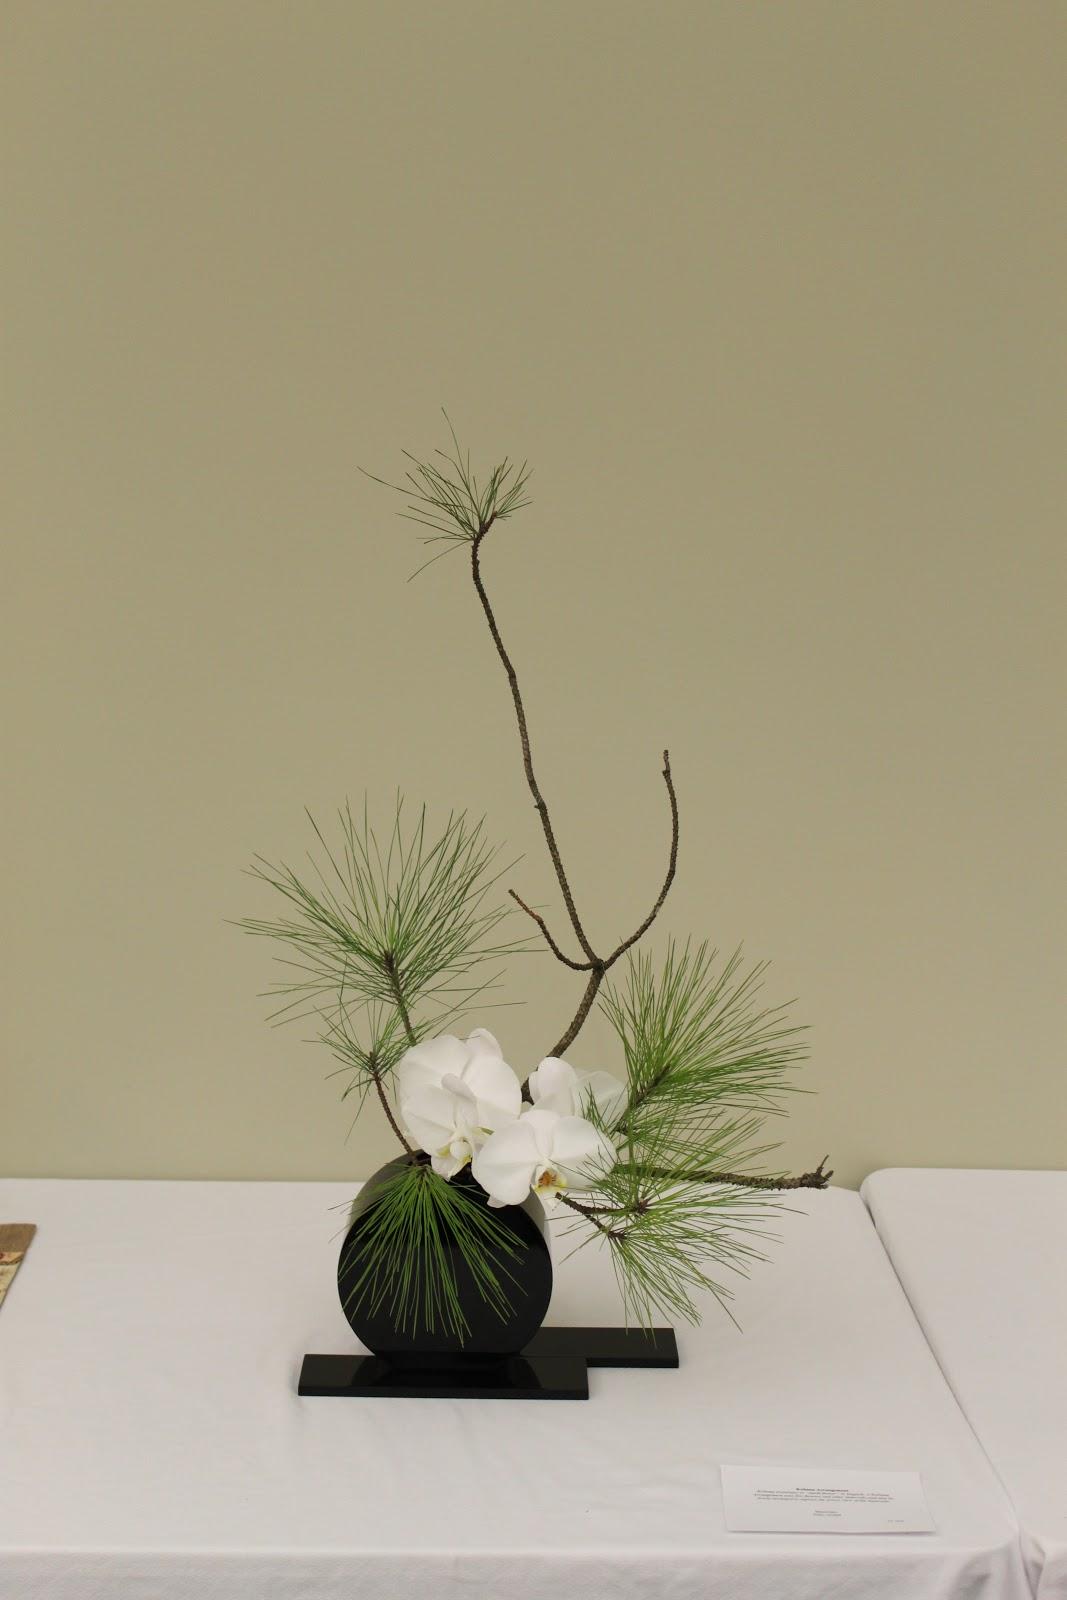 hanamai the ikebana blog January 2013